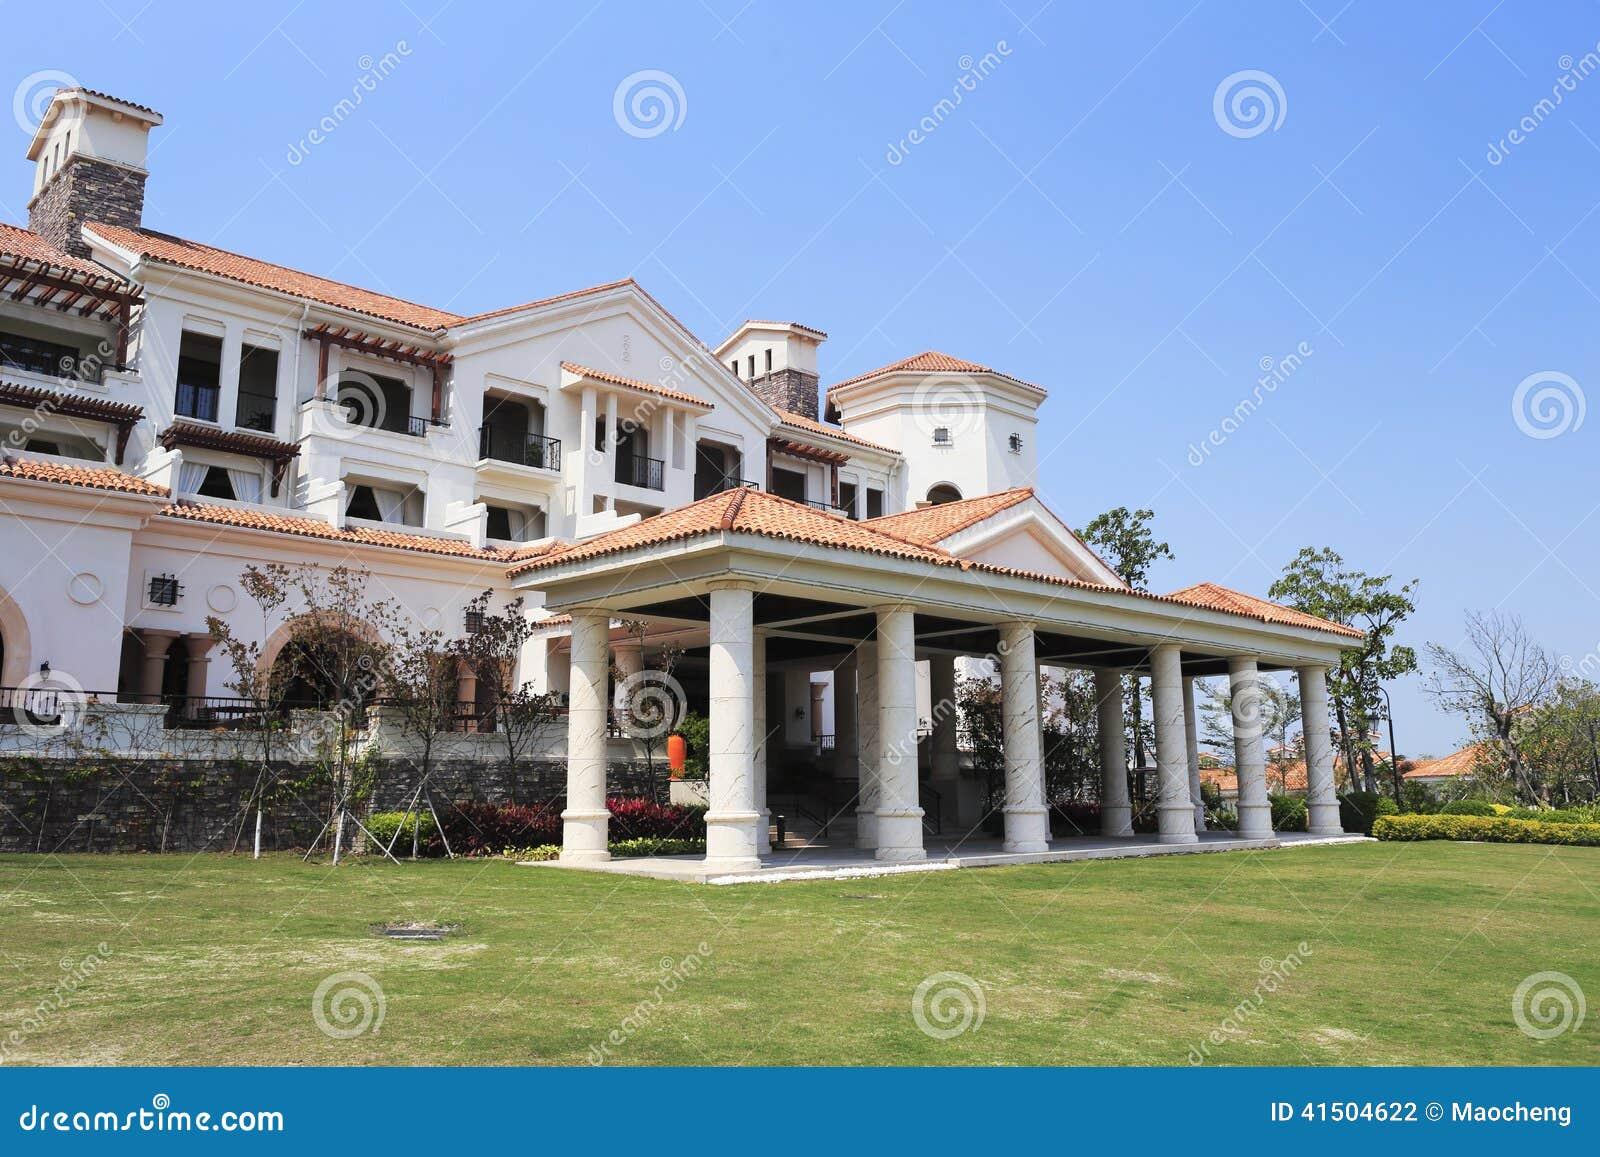 Casas de campo grandes do europeu estilo foto de stock - Estilos de casas ...